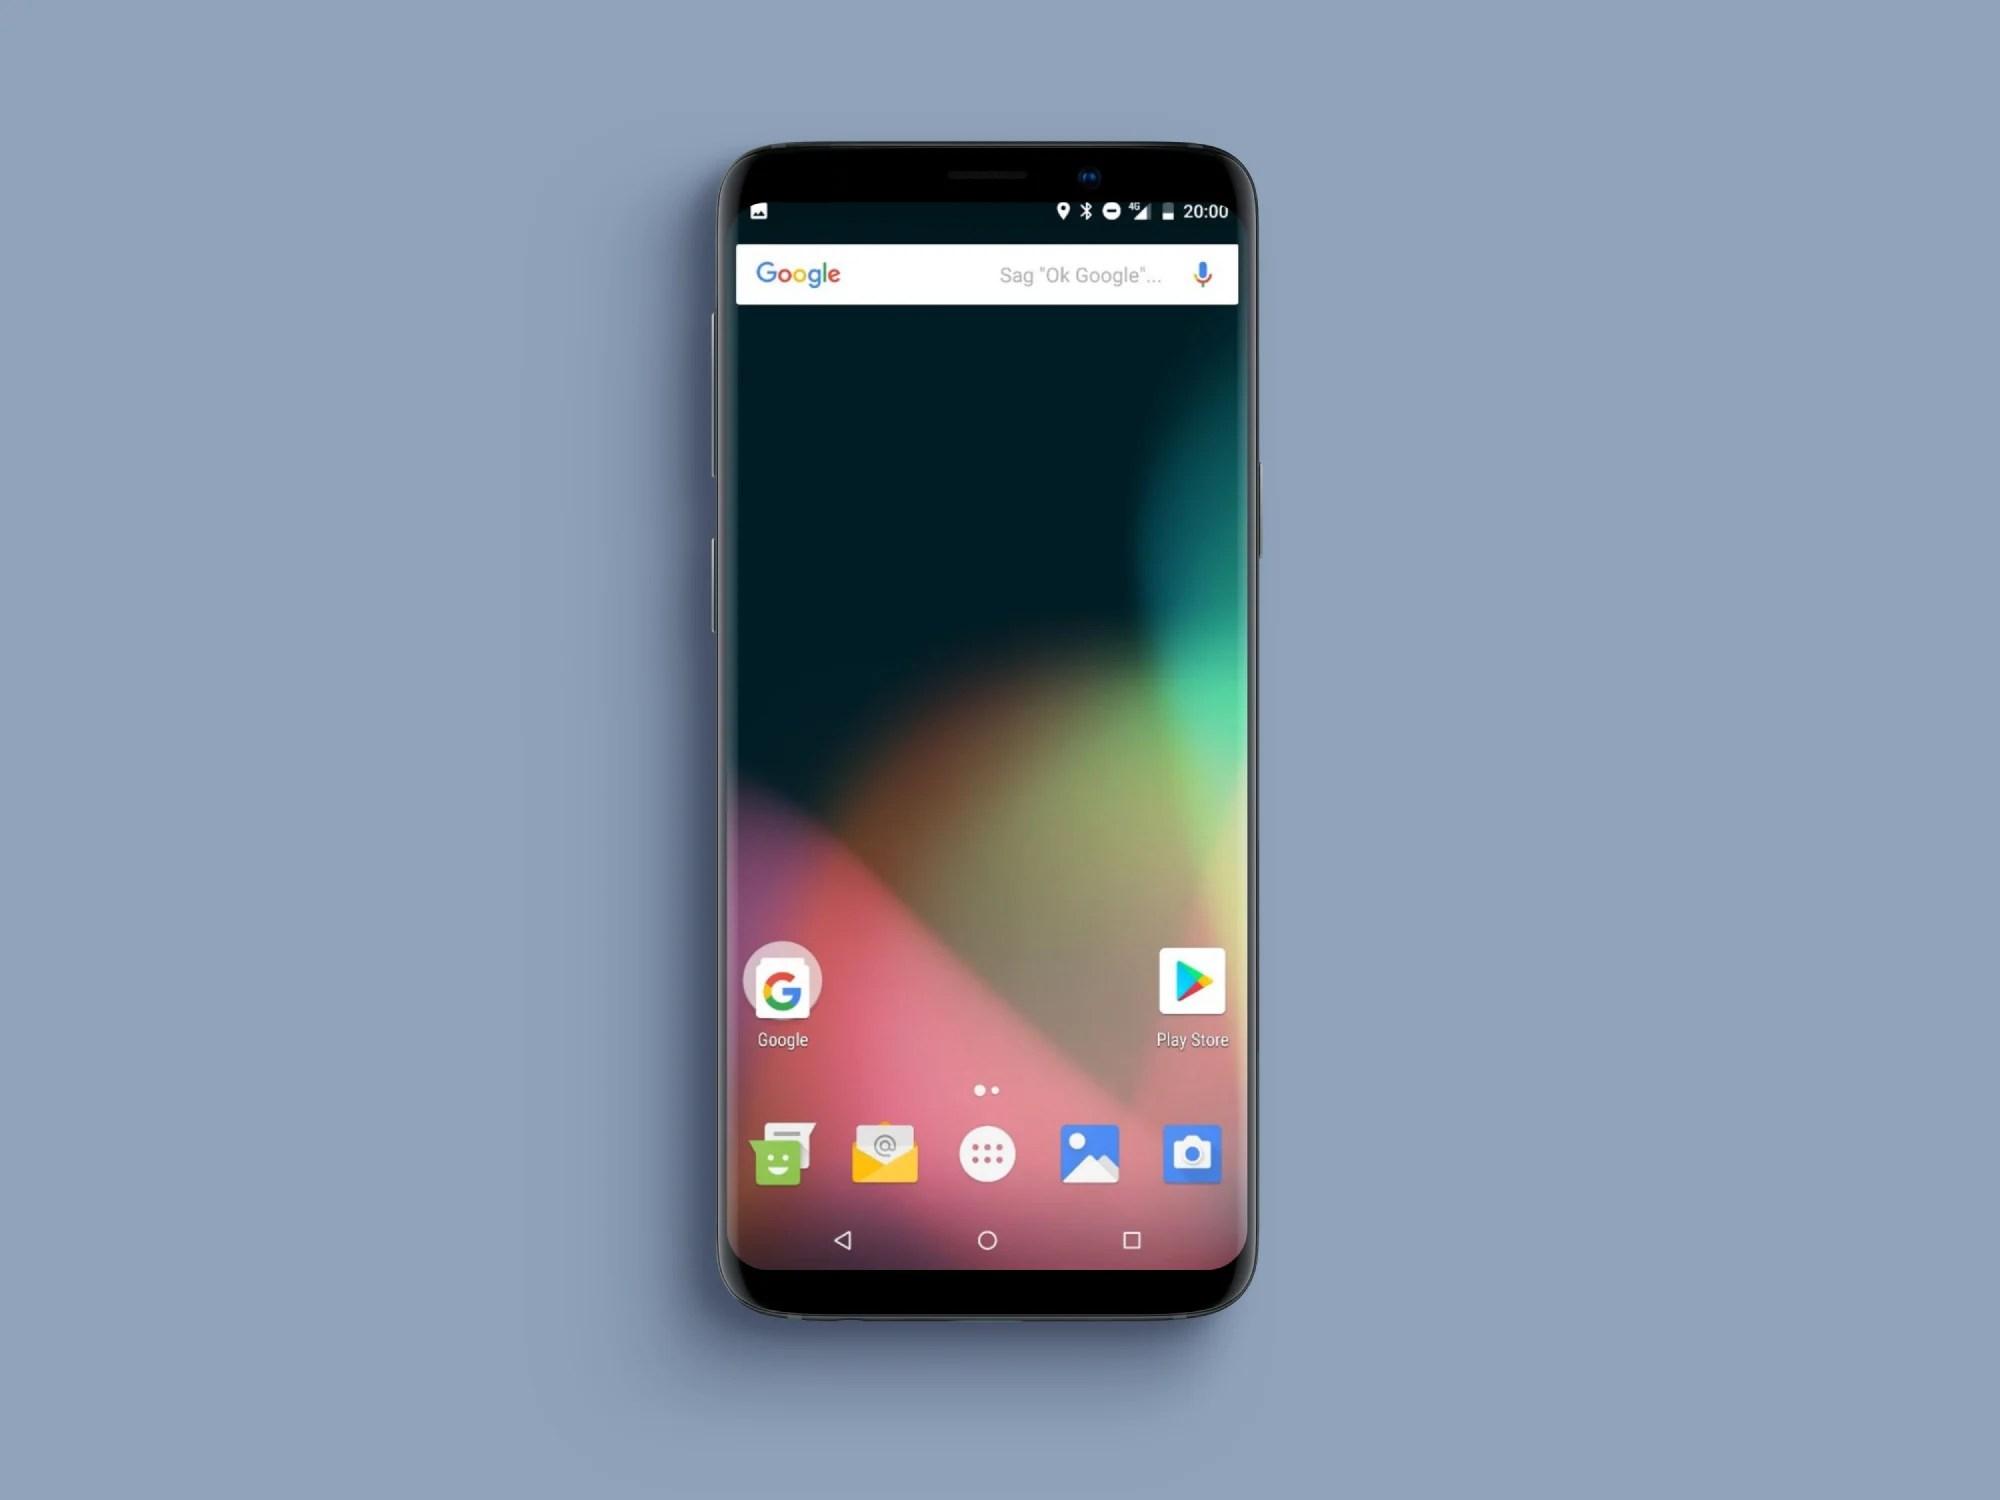 Samsung Galaxy S9 : Android 8.1 Oreo et LineageOS 15.1 désormais compatibles